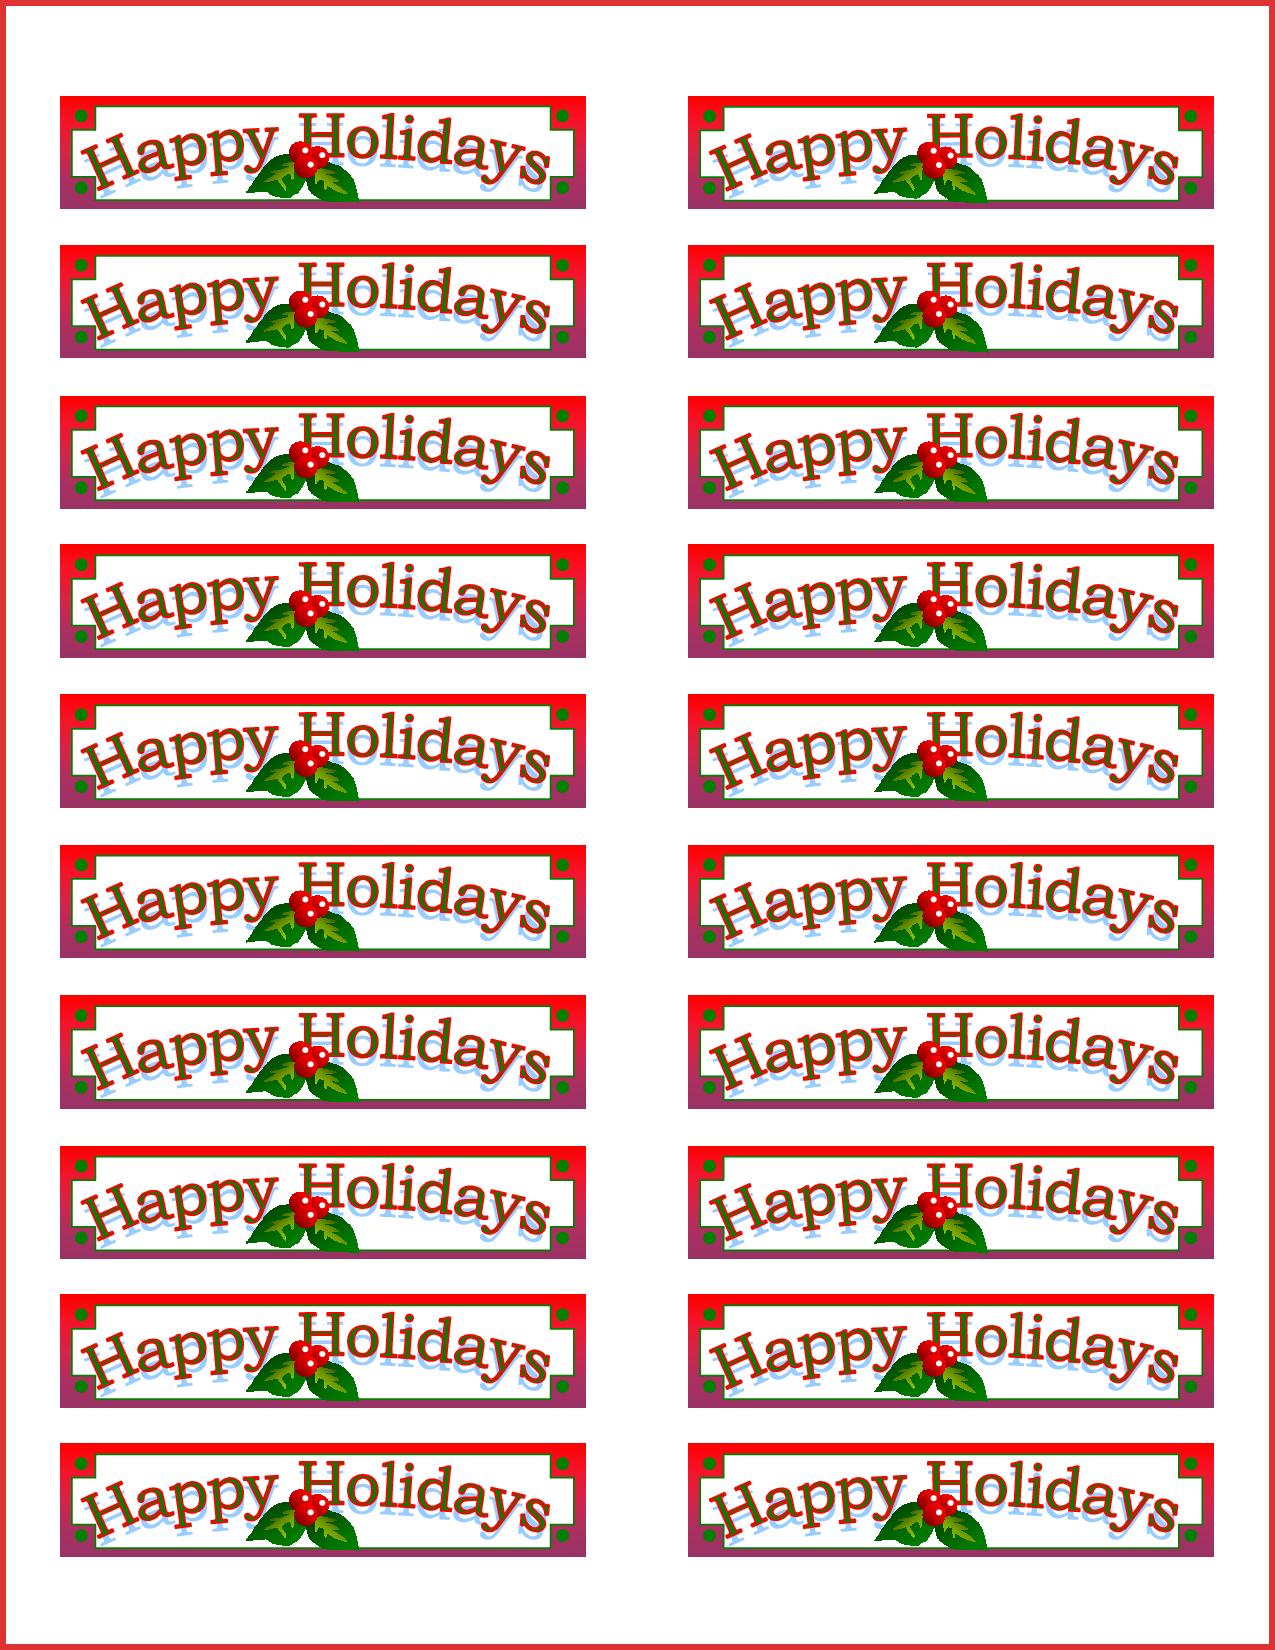 Unique Address Labels Template | Npfg Online - Free Printable Christmas Return Address Label Template